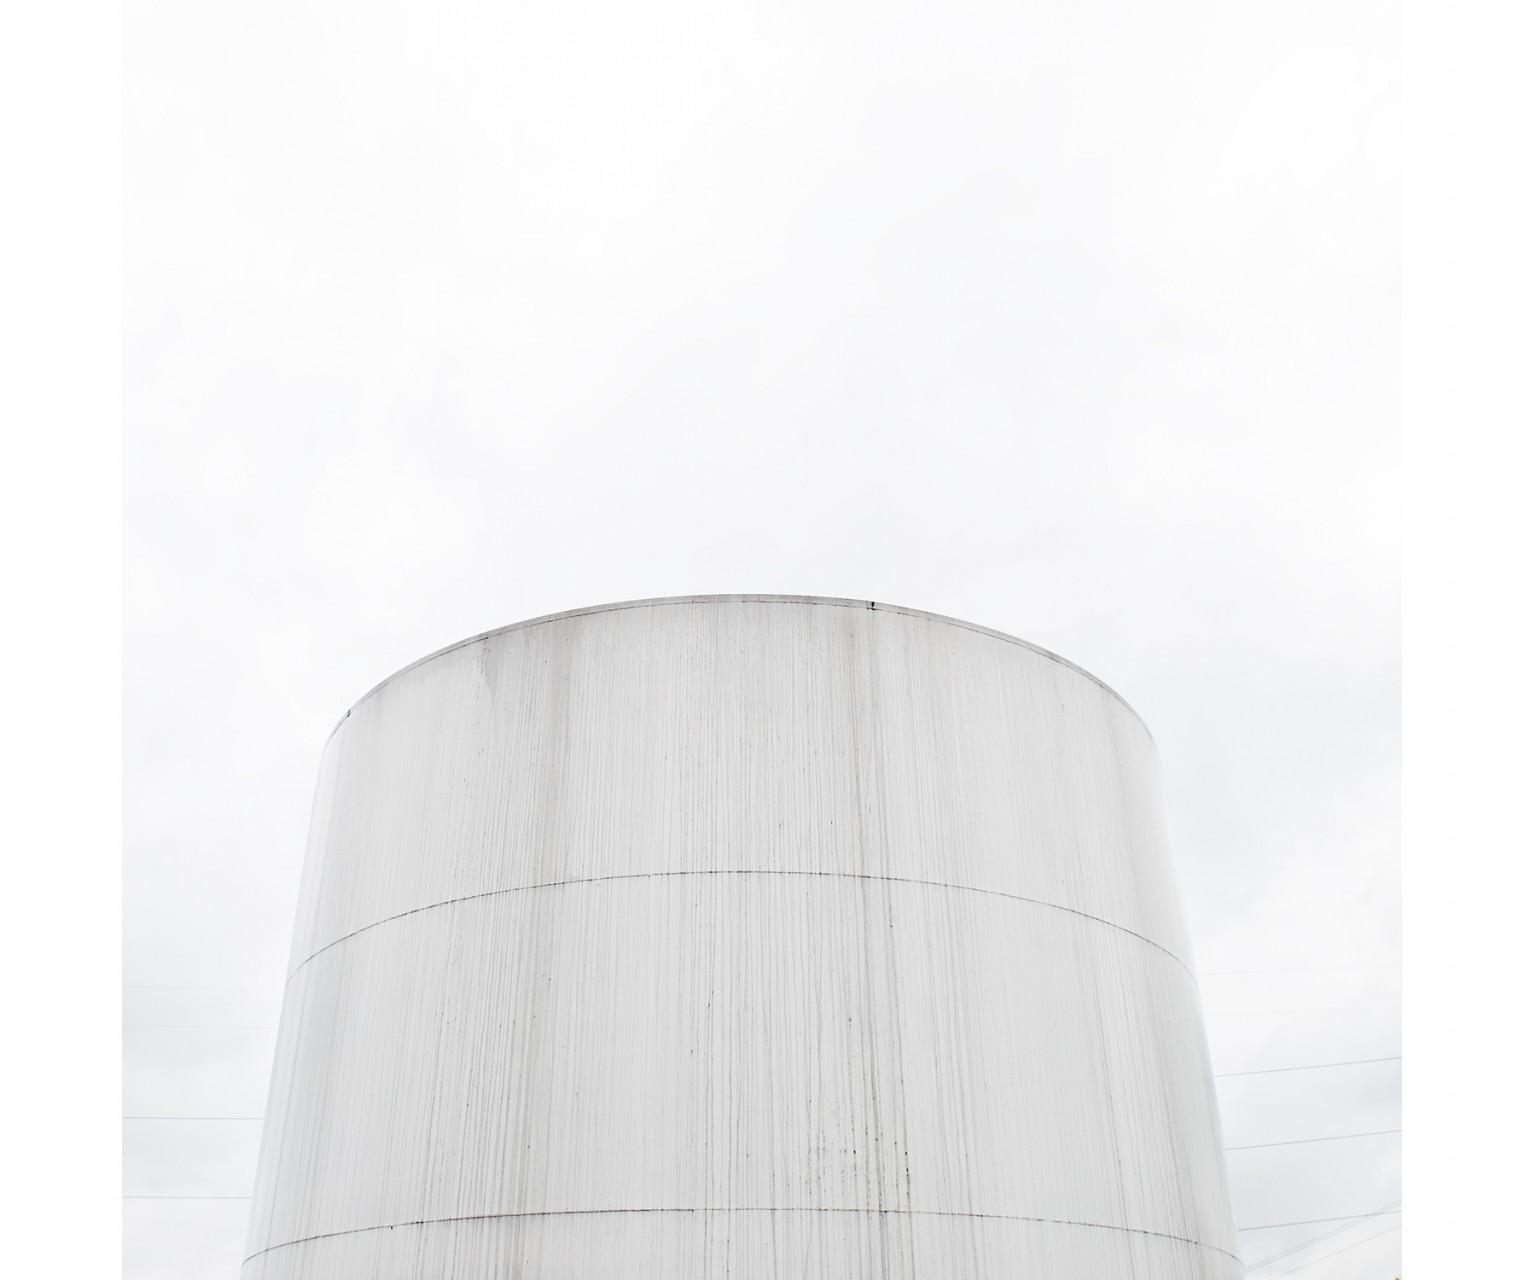 012_Tank